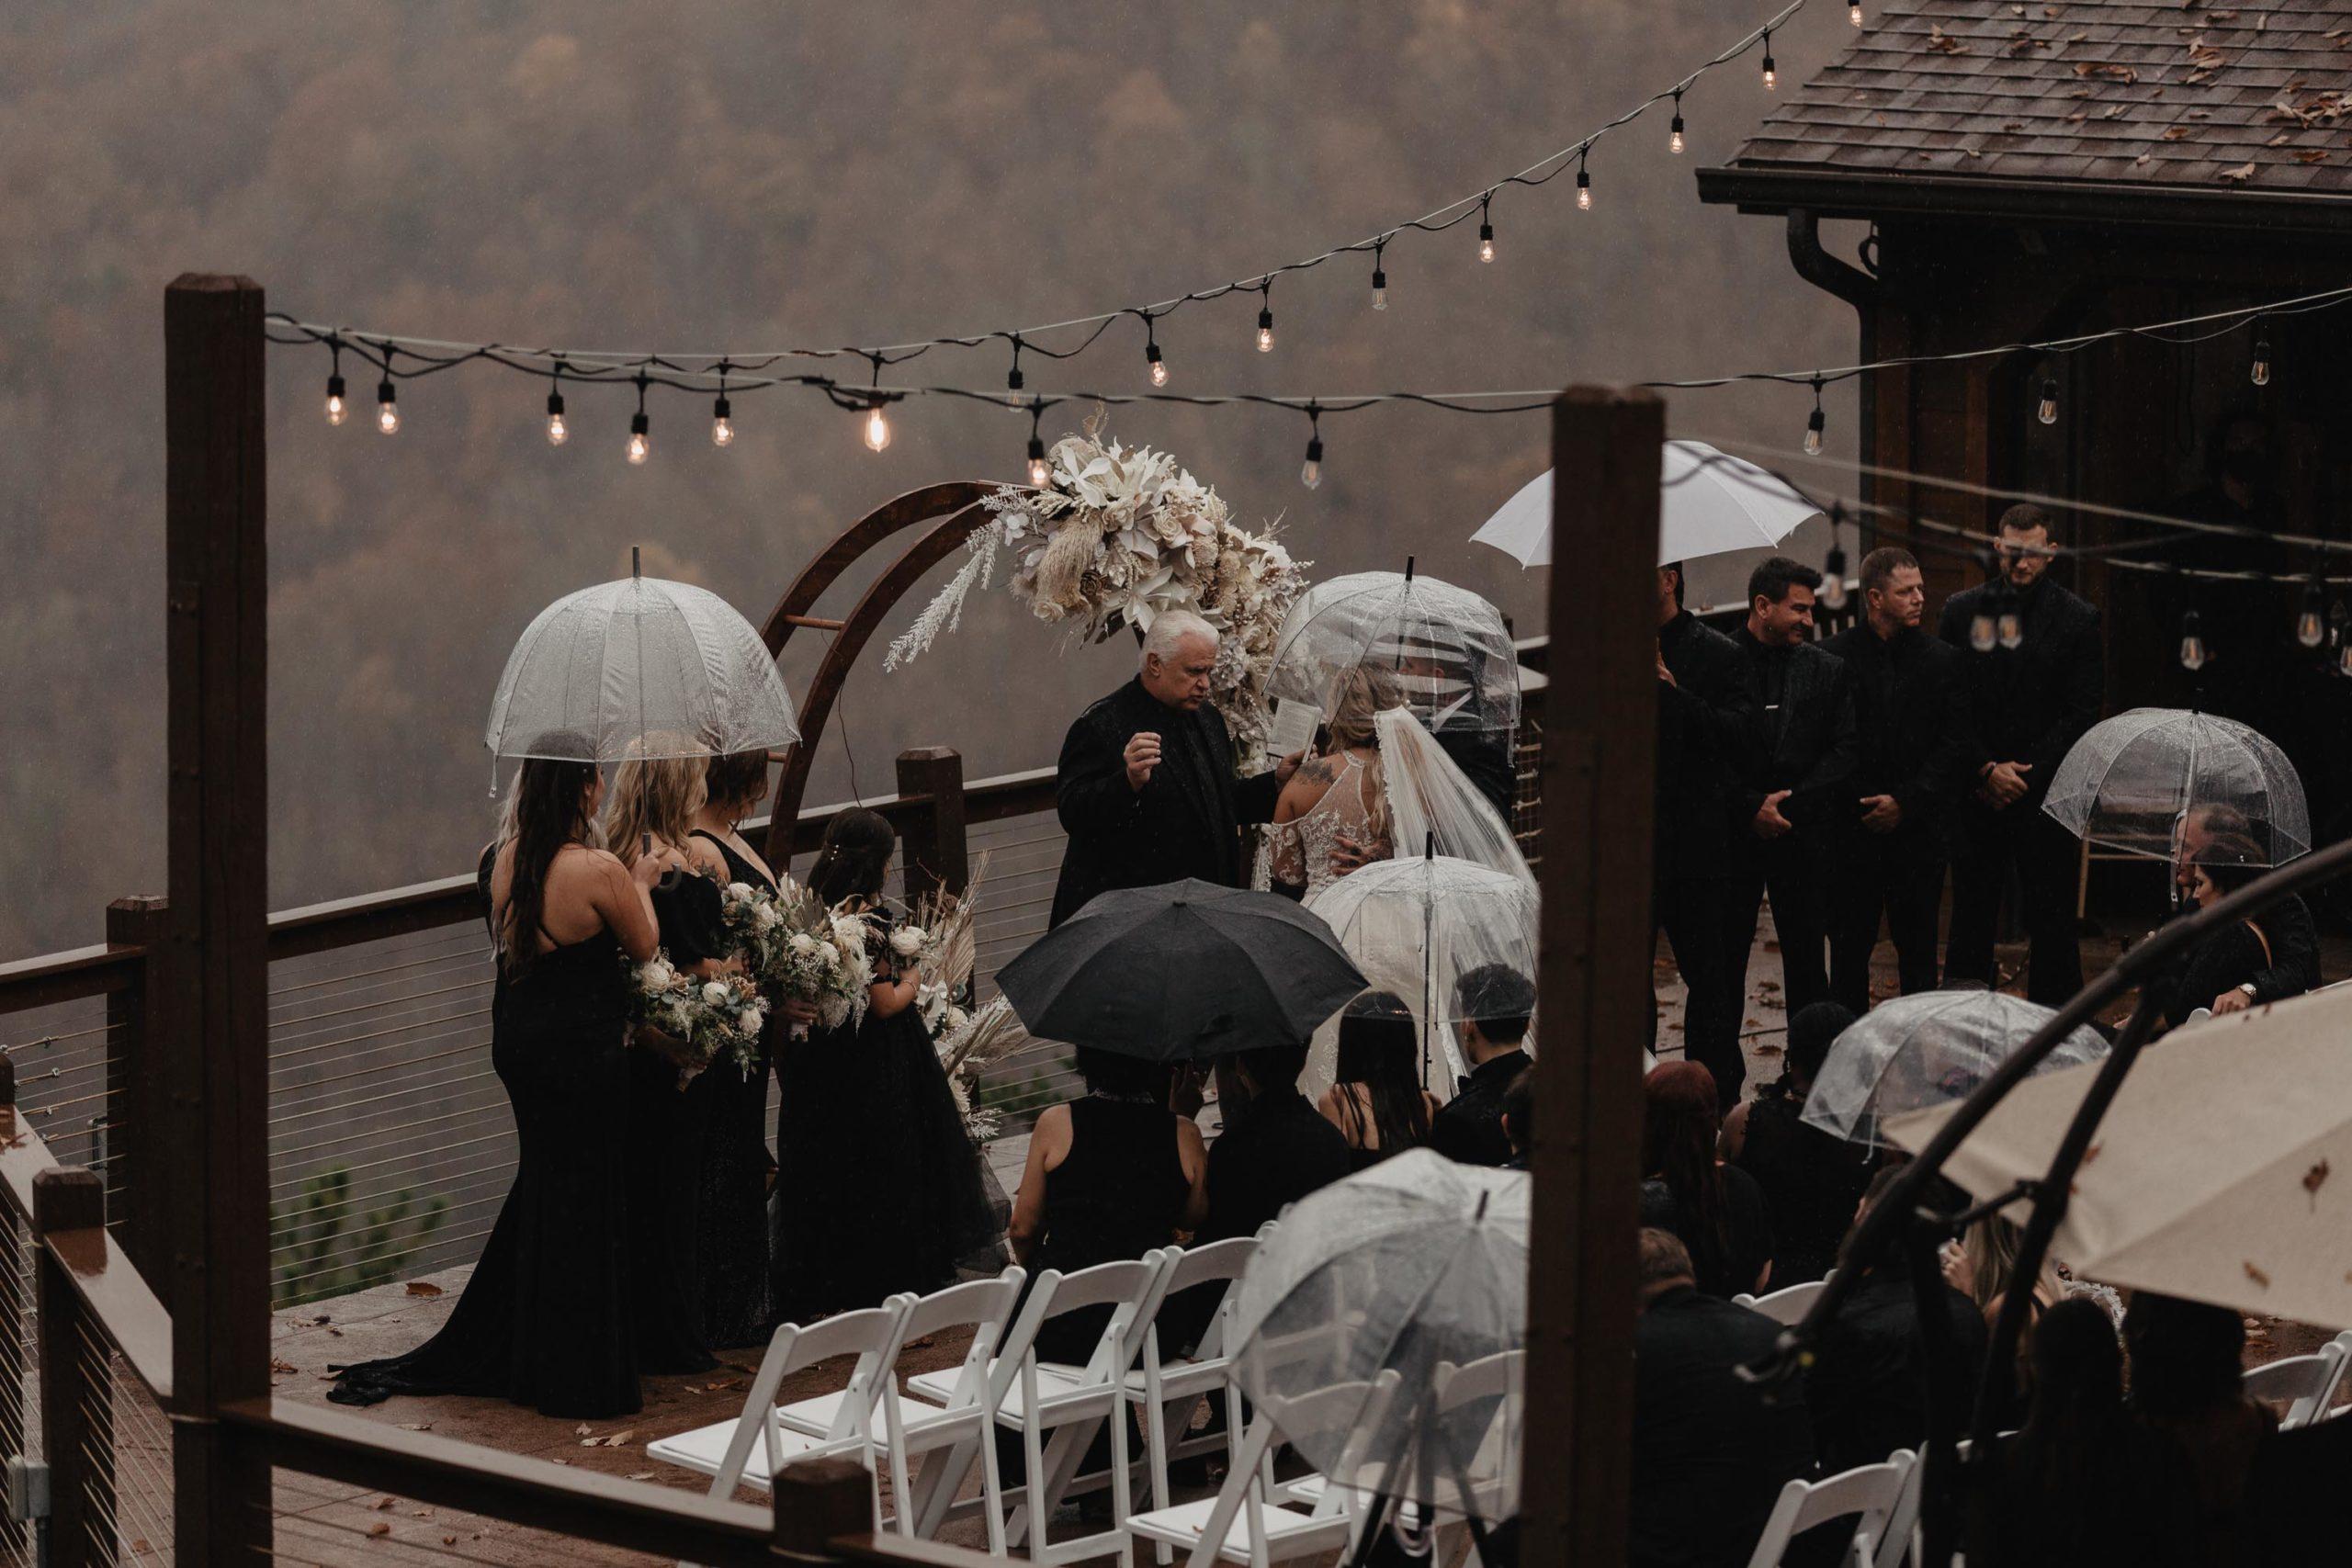 rain storm during wedding ceremony